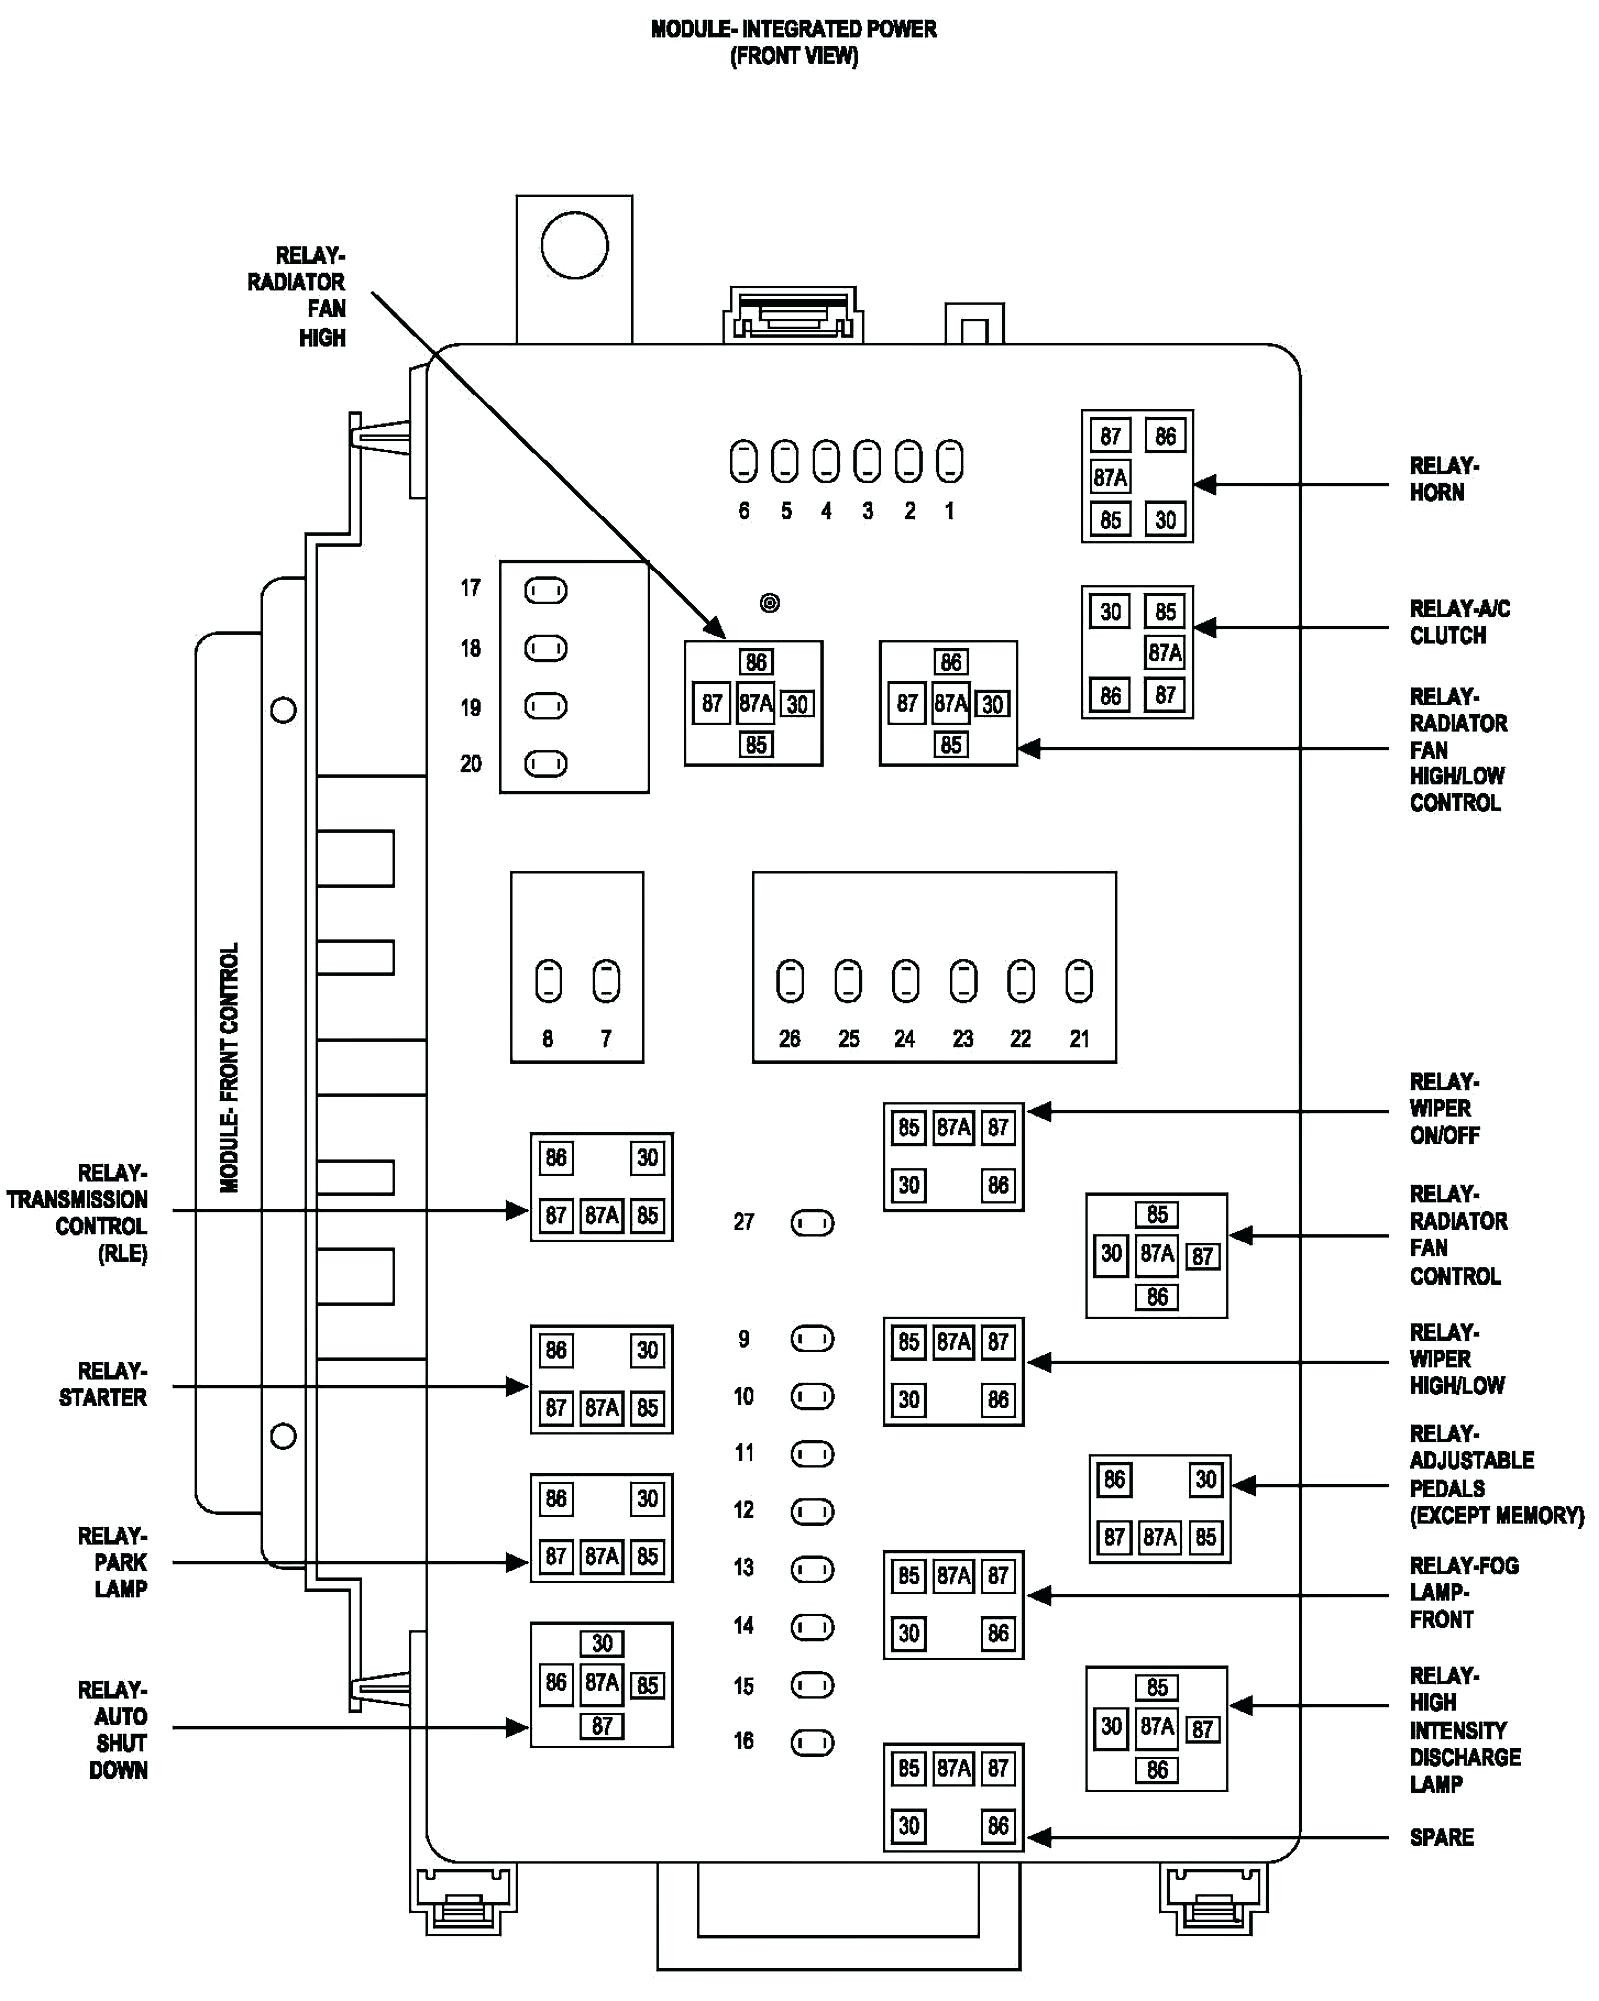 2004 sebring air bag schematic 63kenmo lpde